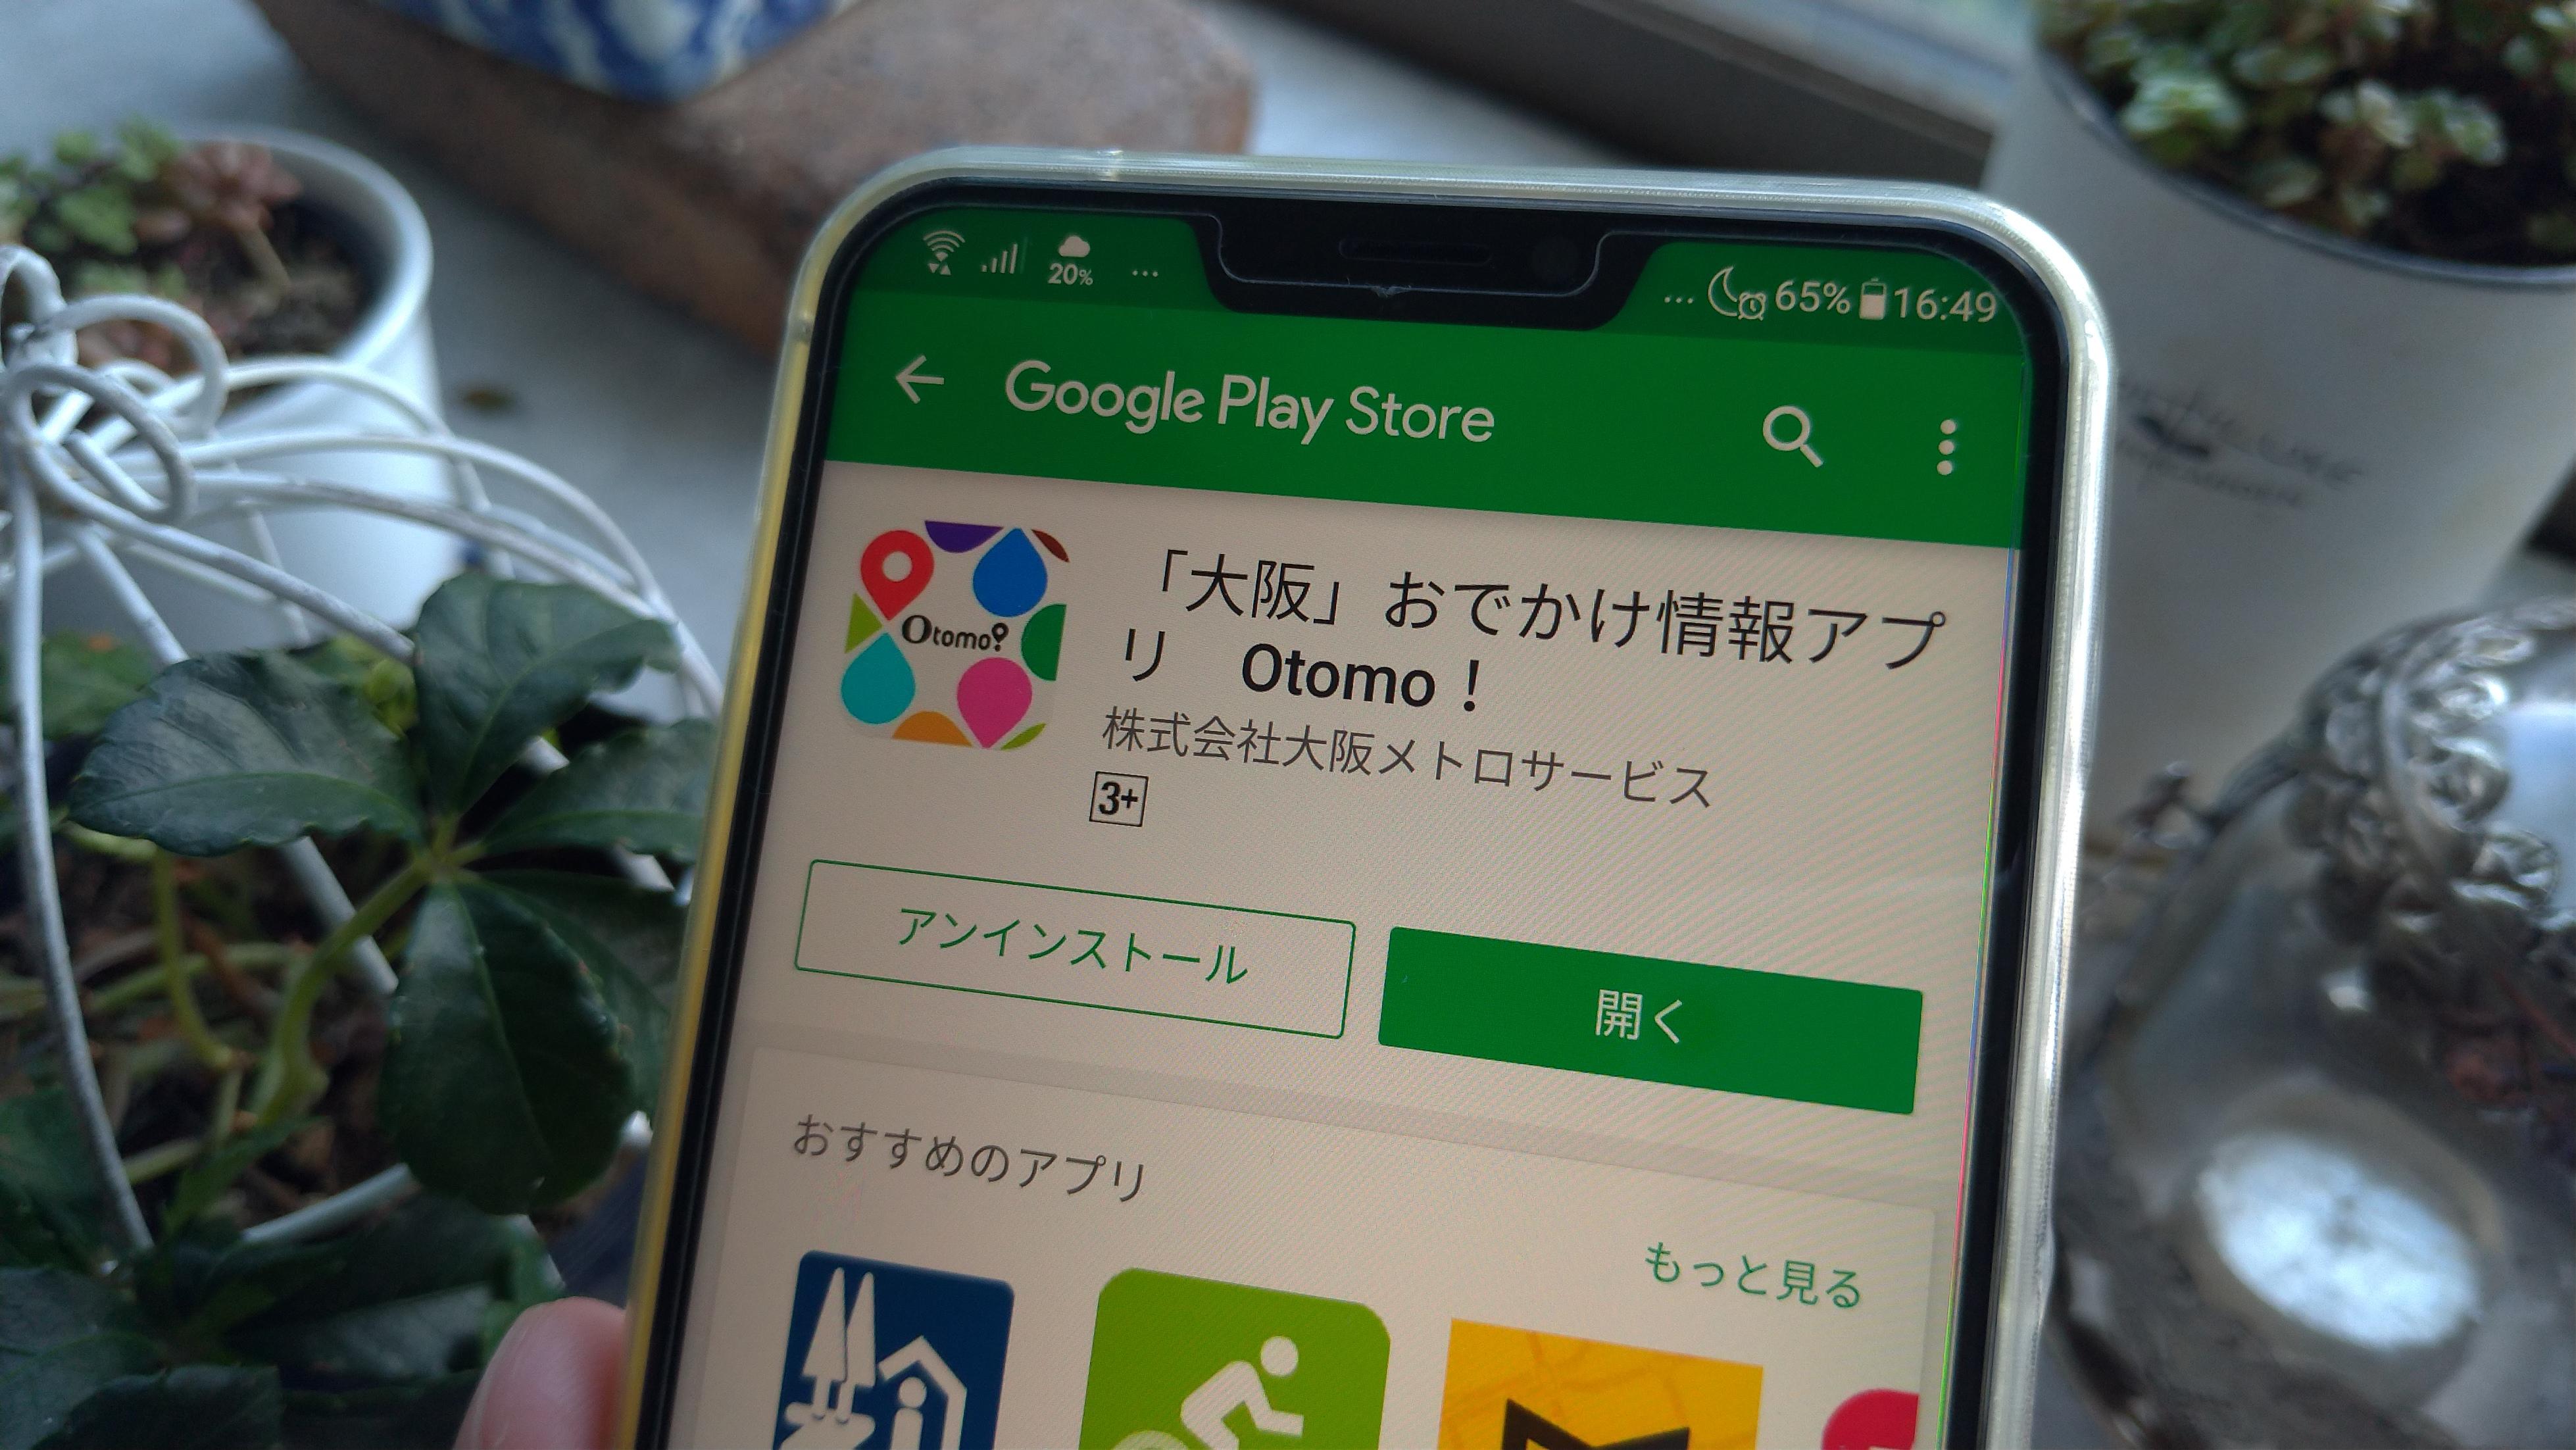 「Otomo!」の容量